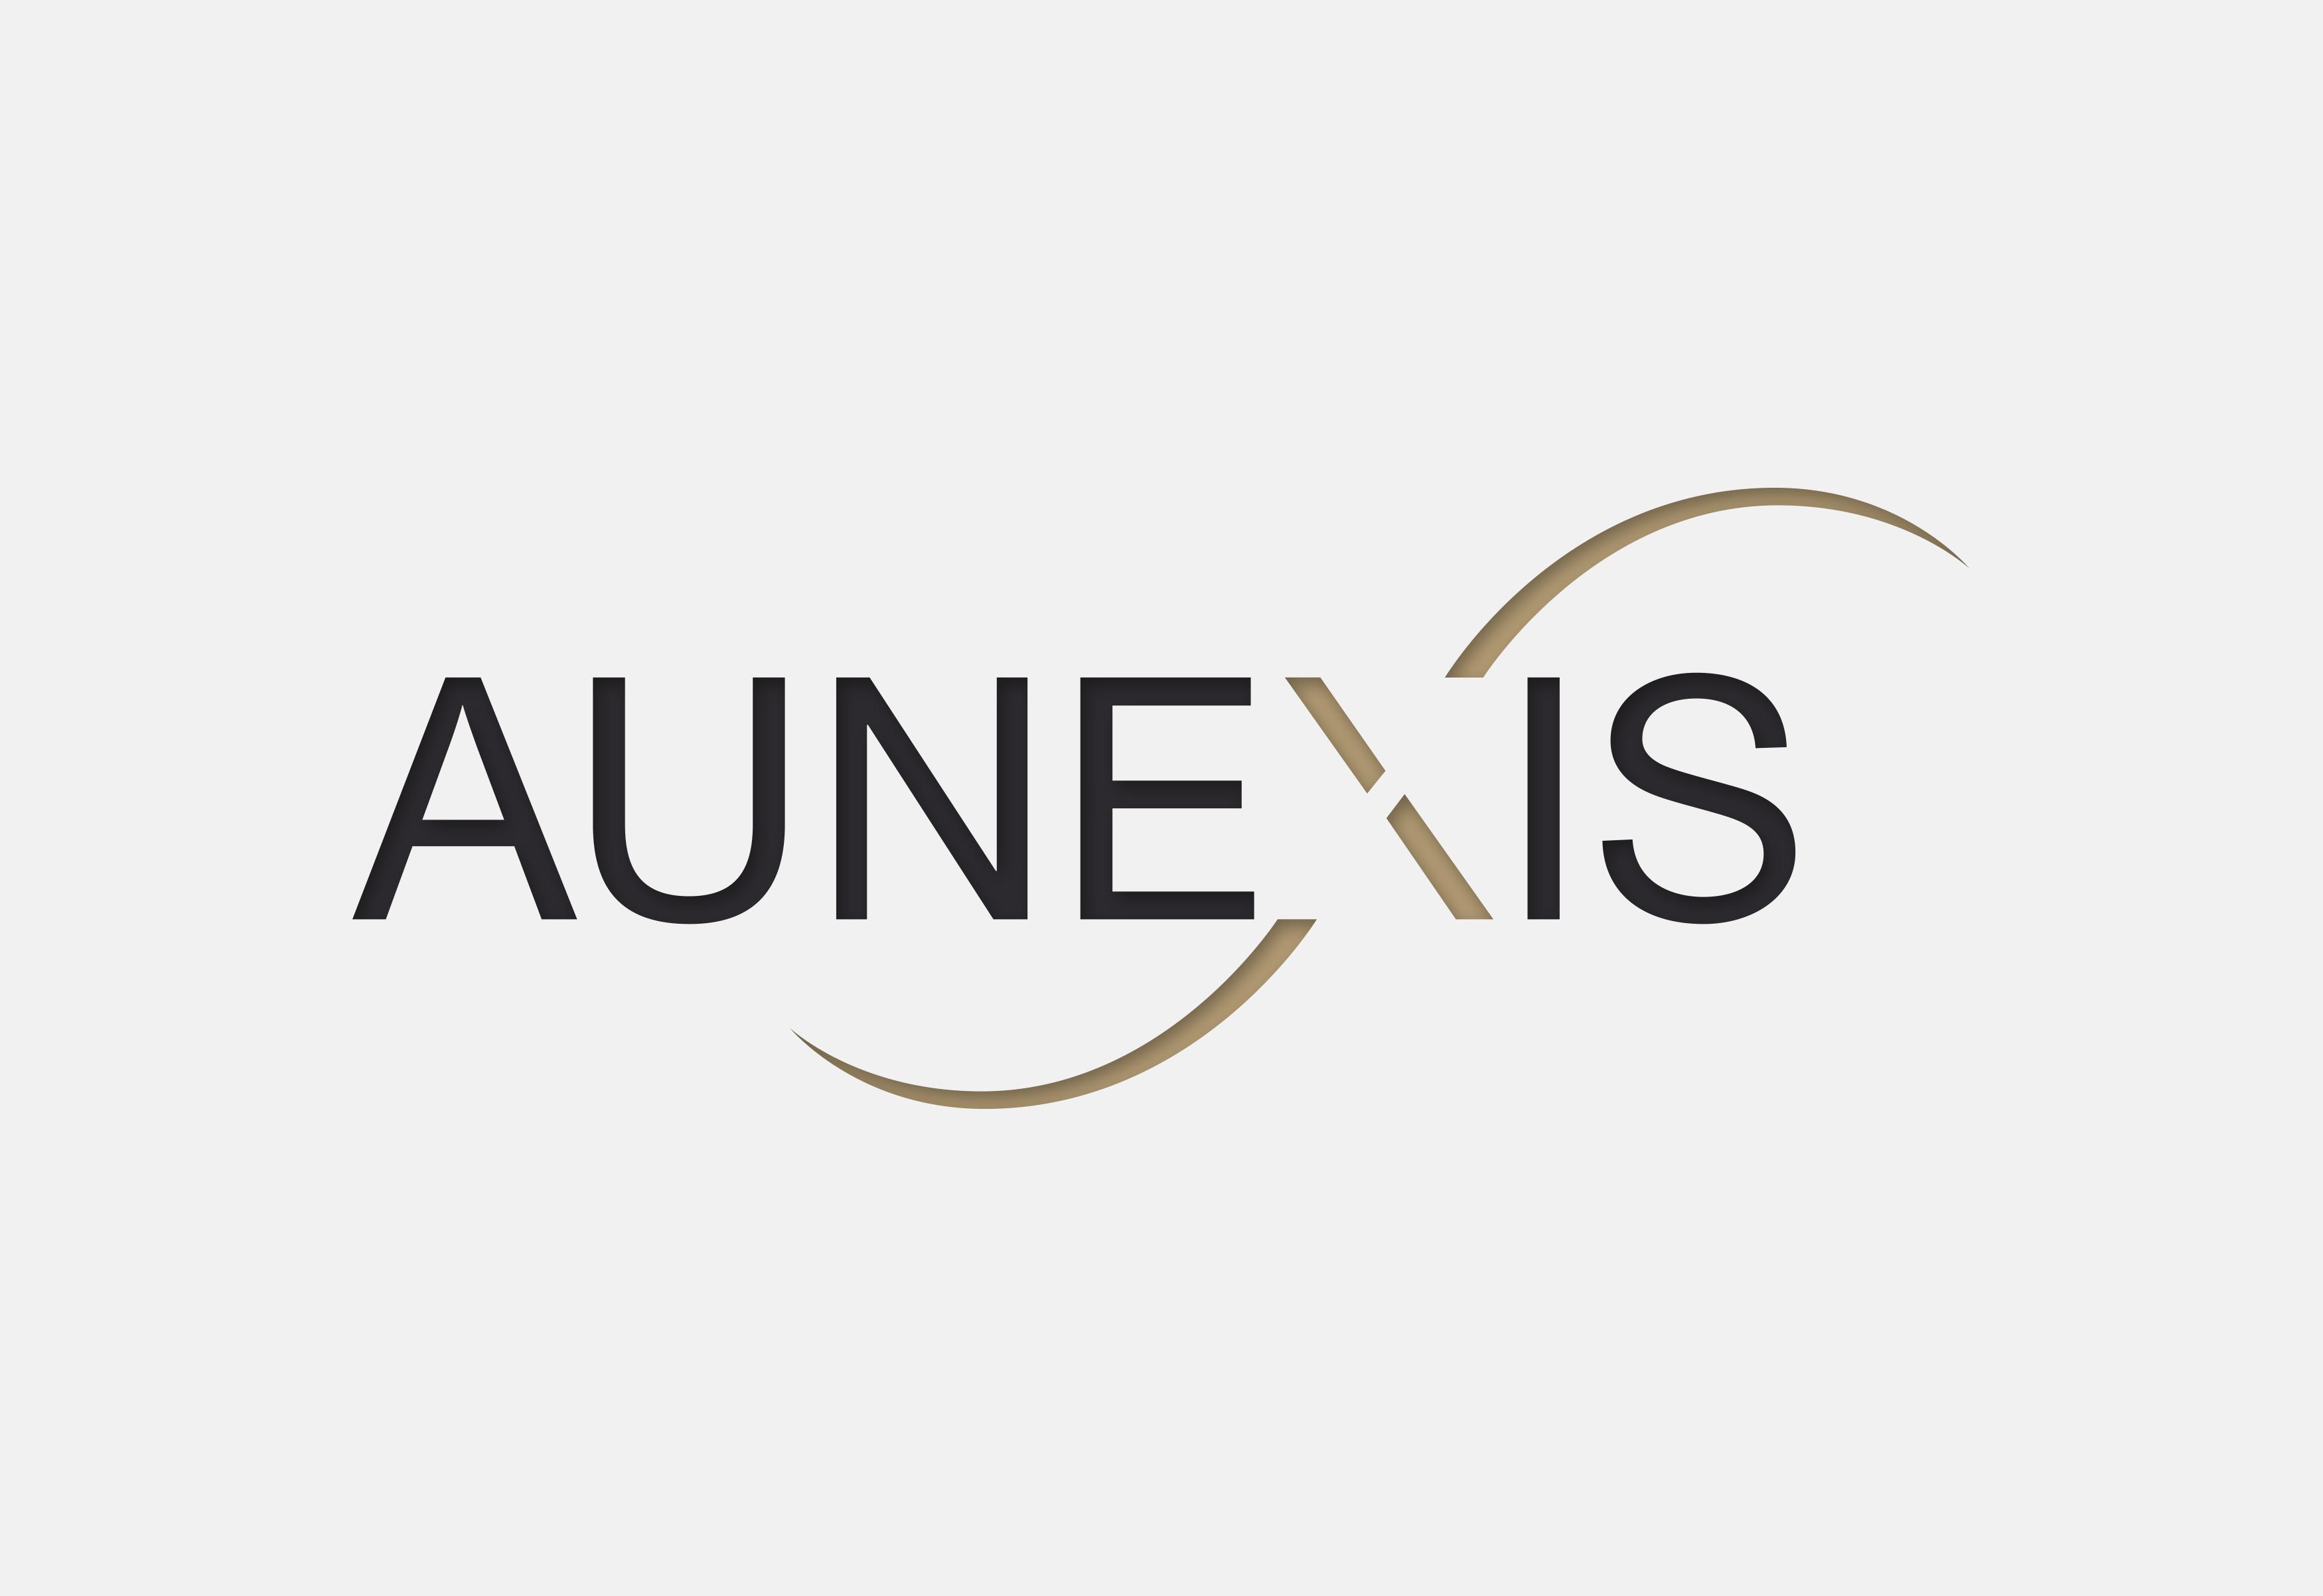 Aunexis Logo Marke Naming Markenführung